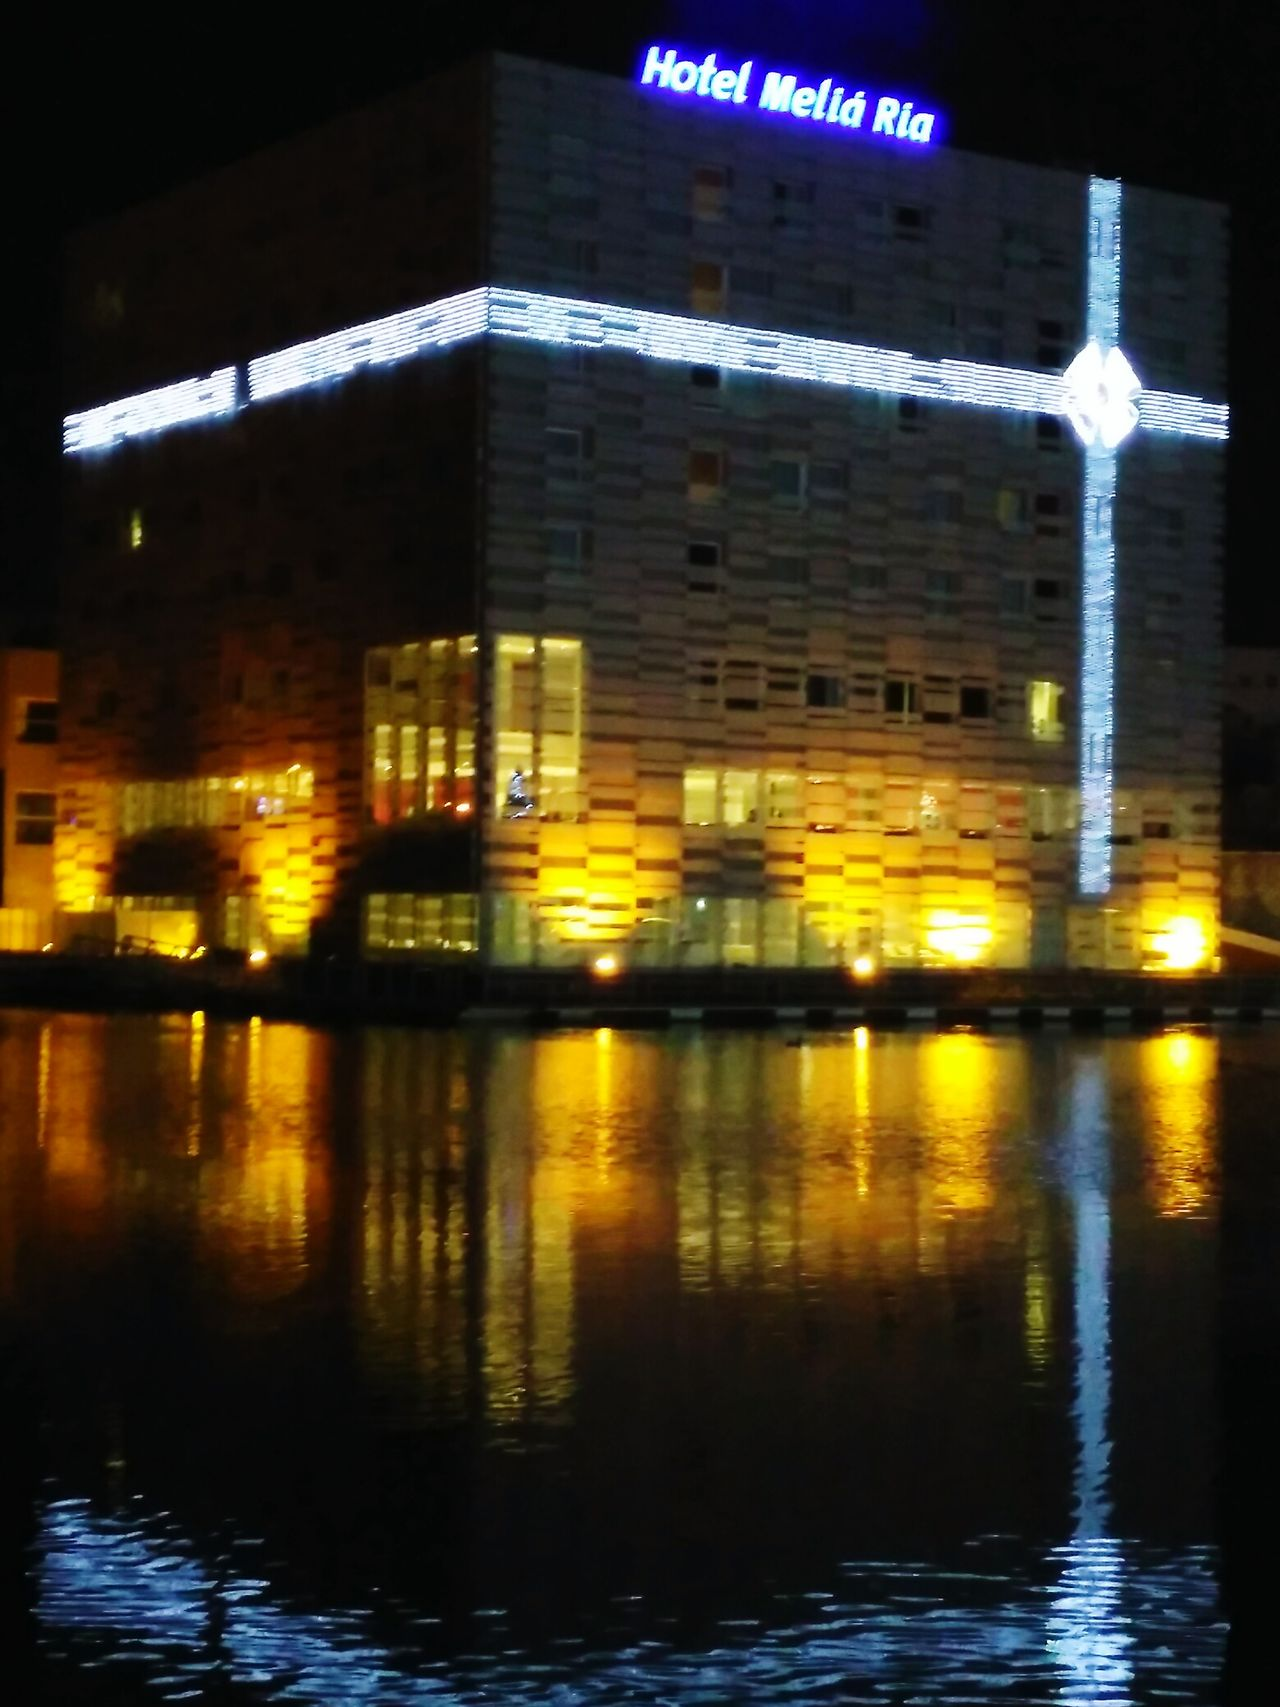 Aveiro Natal Melia Hotel Reflection Illuminated Night Water No People Outdoors City Architecture Sky